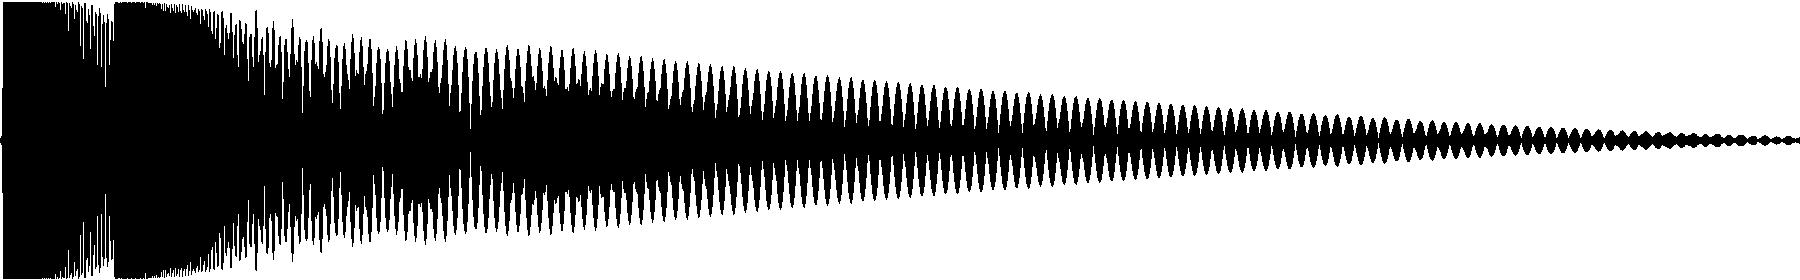 zap system 1